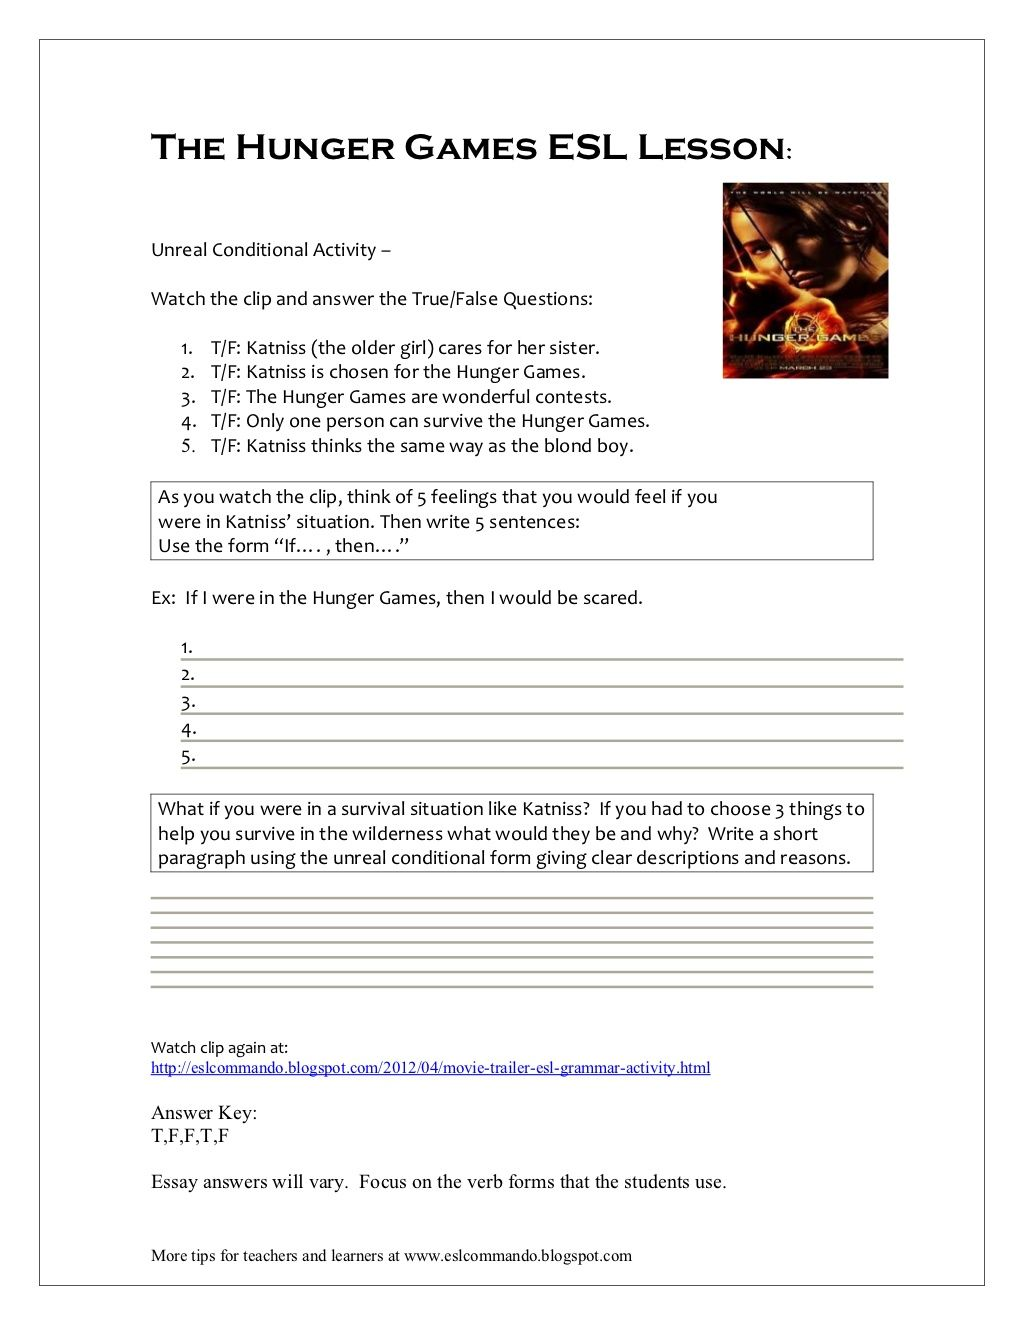 resume The Hunger Games Resume the hunger games esl lesson by phricee via slideshare ideas essay on book lesson